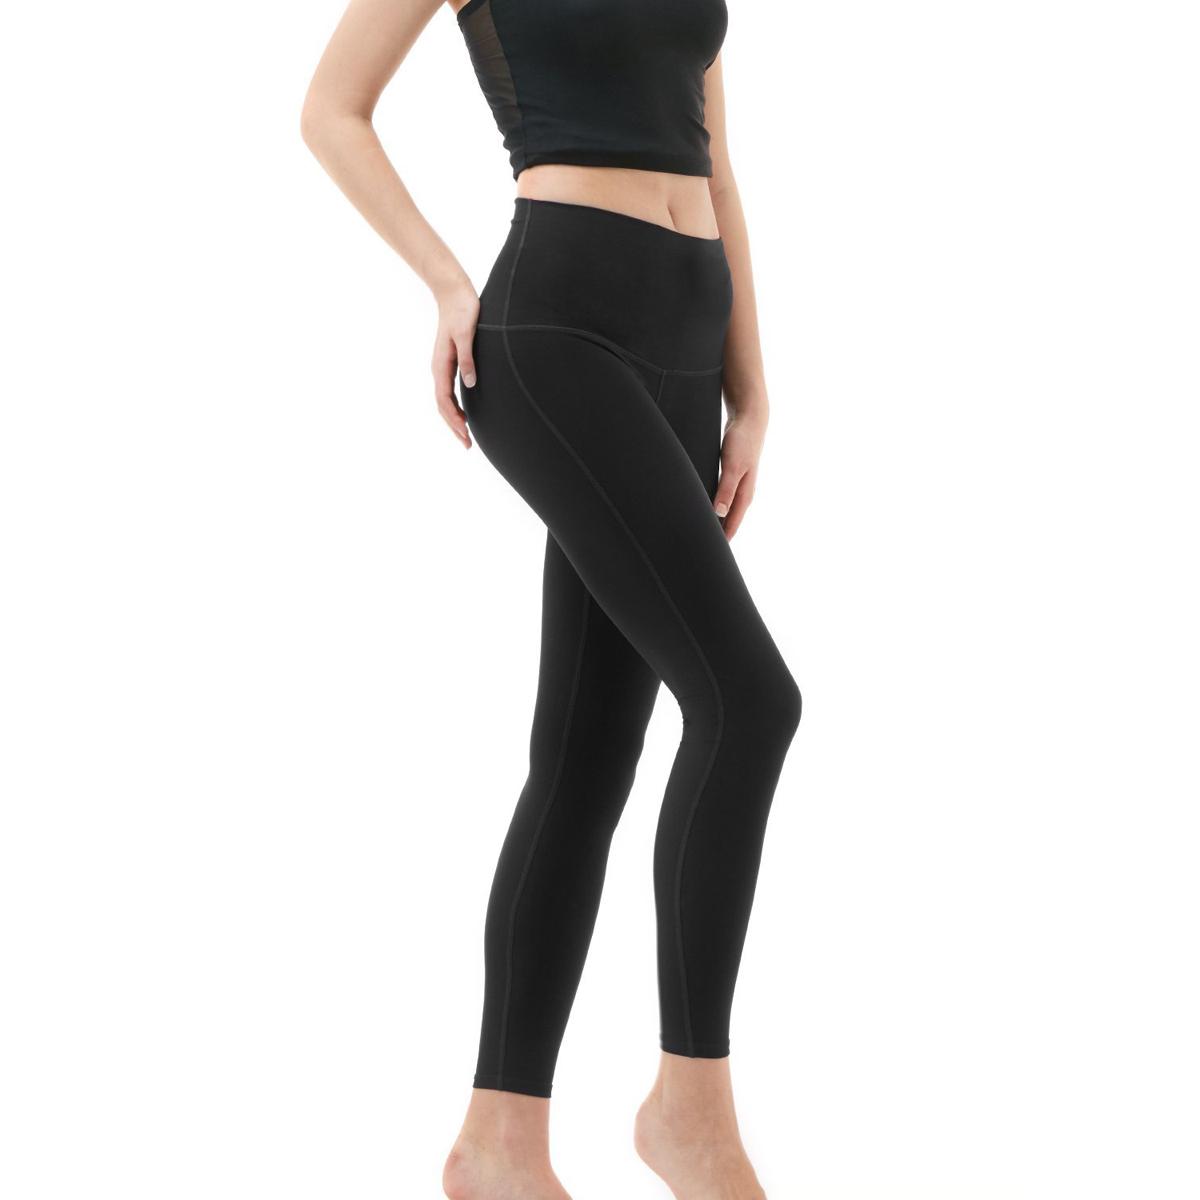 thumbnail 23 - TSLA Tesla FYP42 Women's High-Waisted Ultra-Stretch Tummy Control Yoga Pants